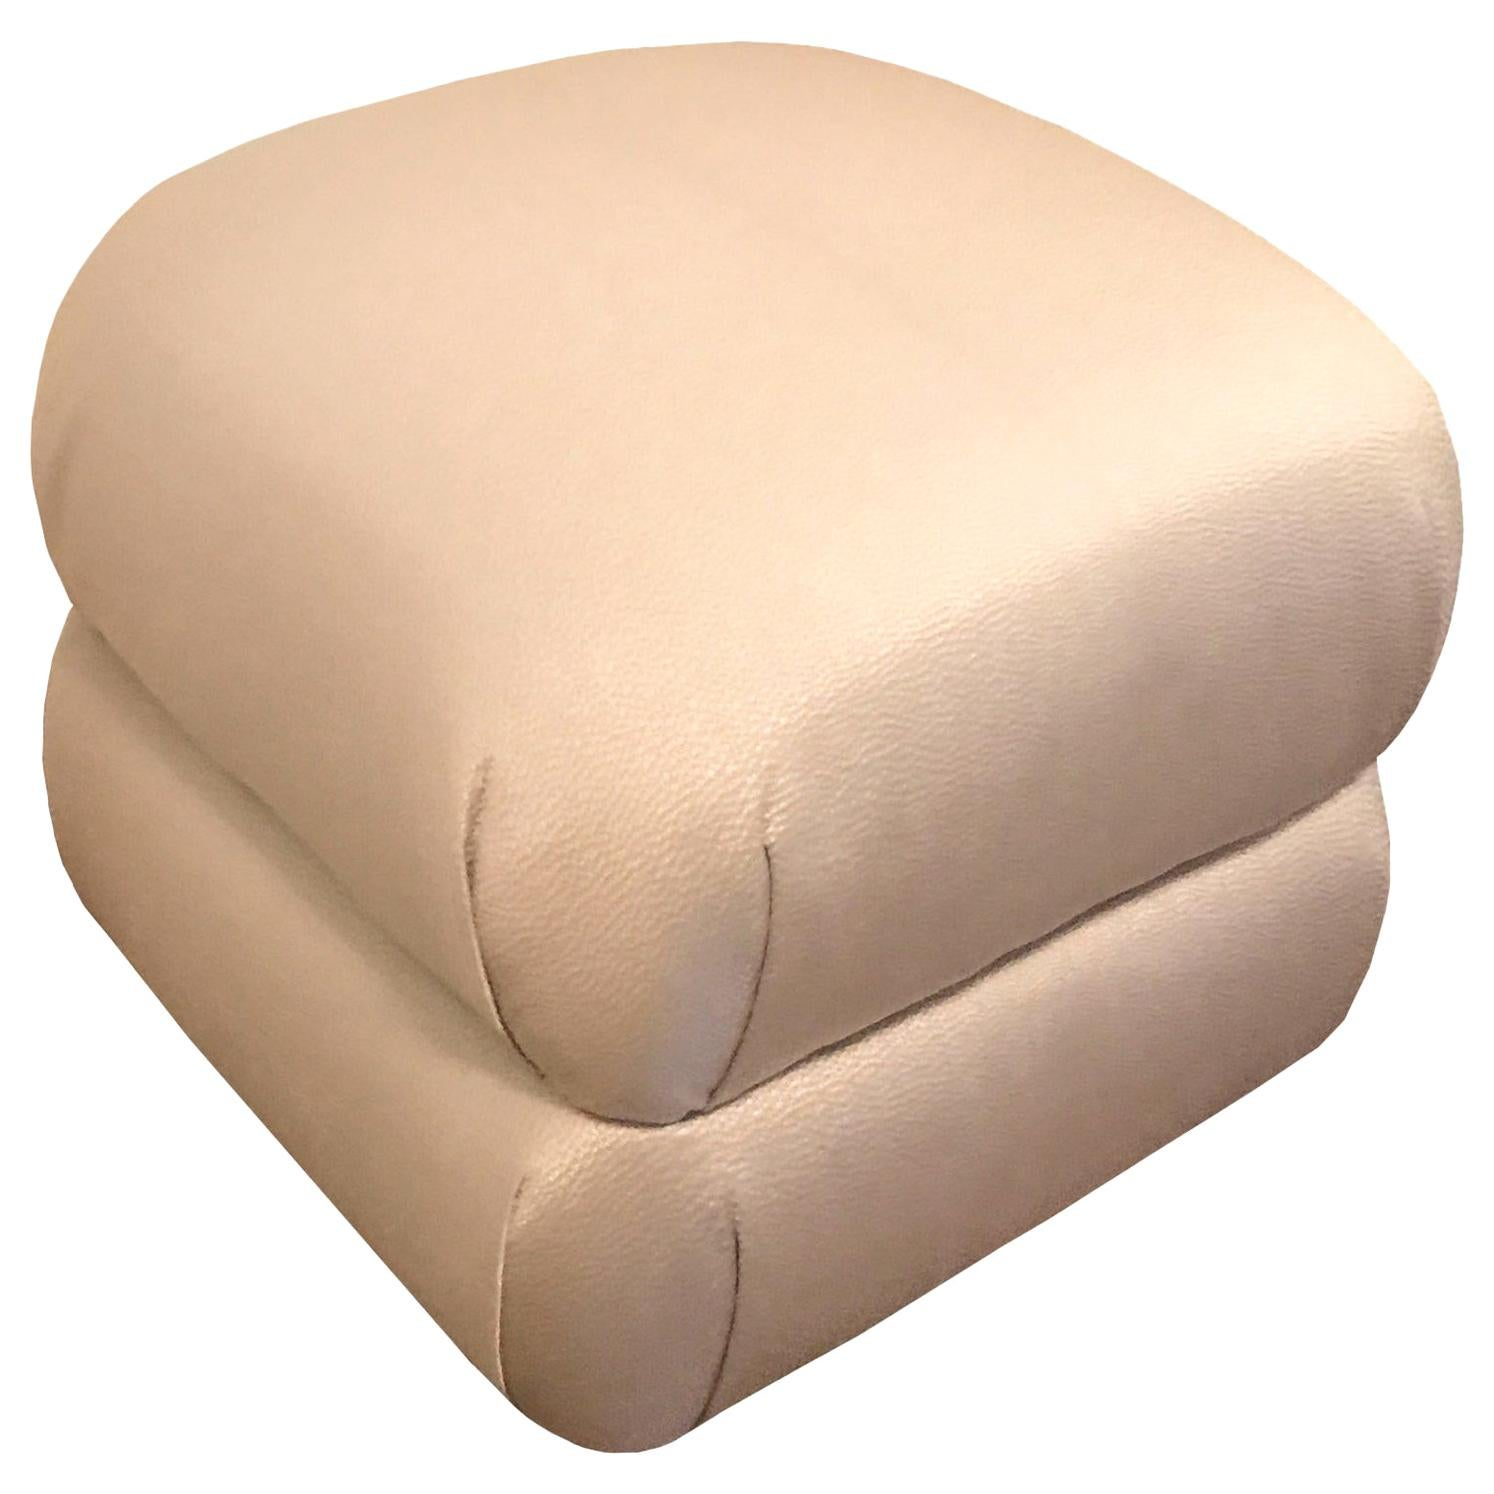 Custom Upholstered Pouf Ottomans in Gray or COM